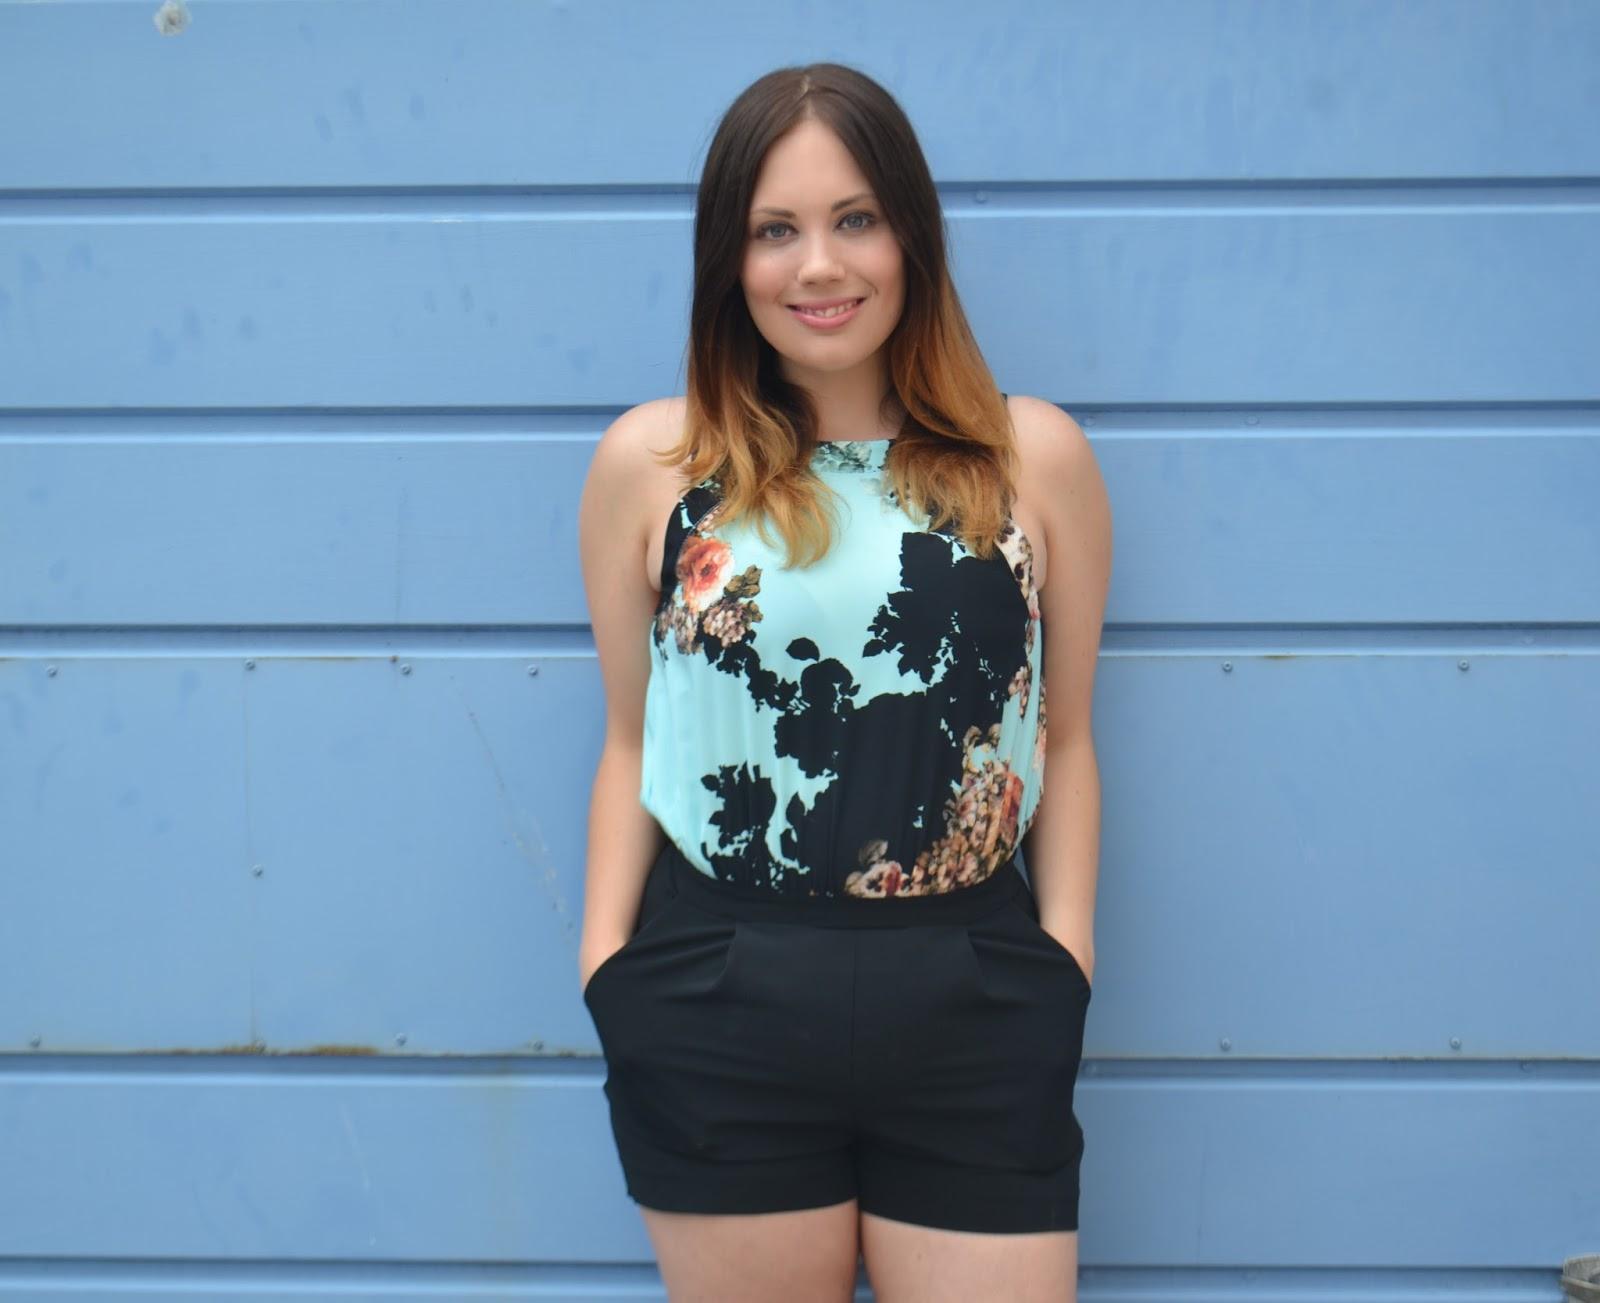 69b4d7c68b Forevermissvanity - A UK Lifestyle Blogger   Summer Playsuits  River ...